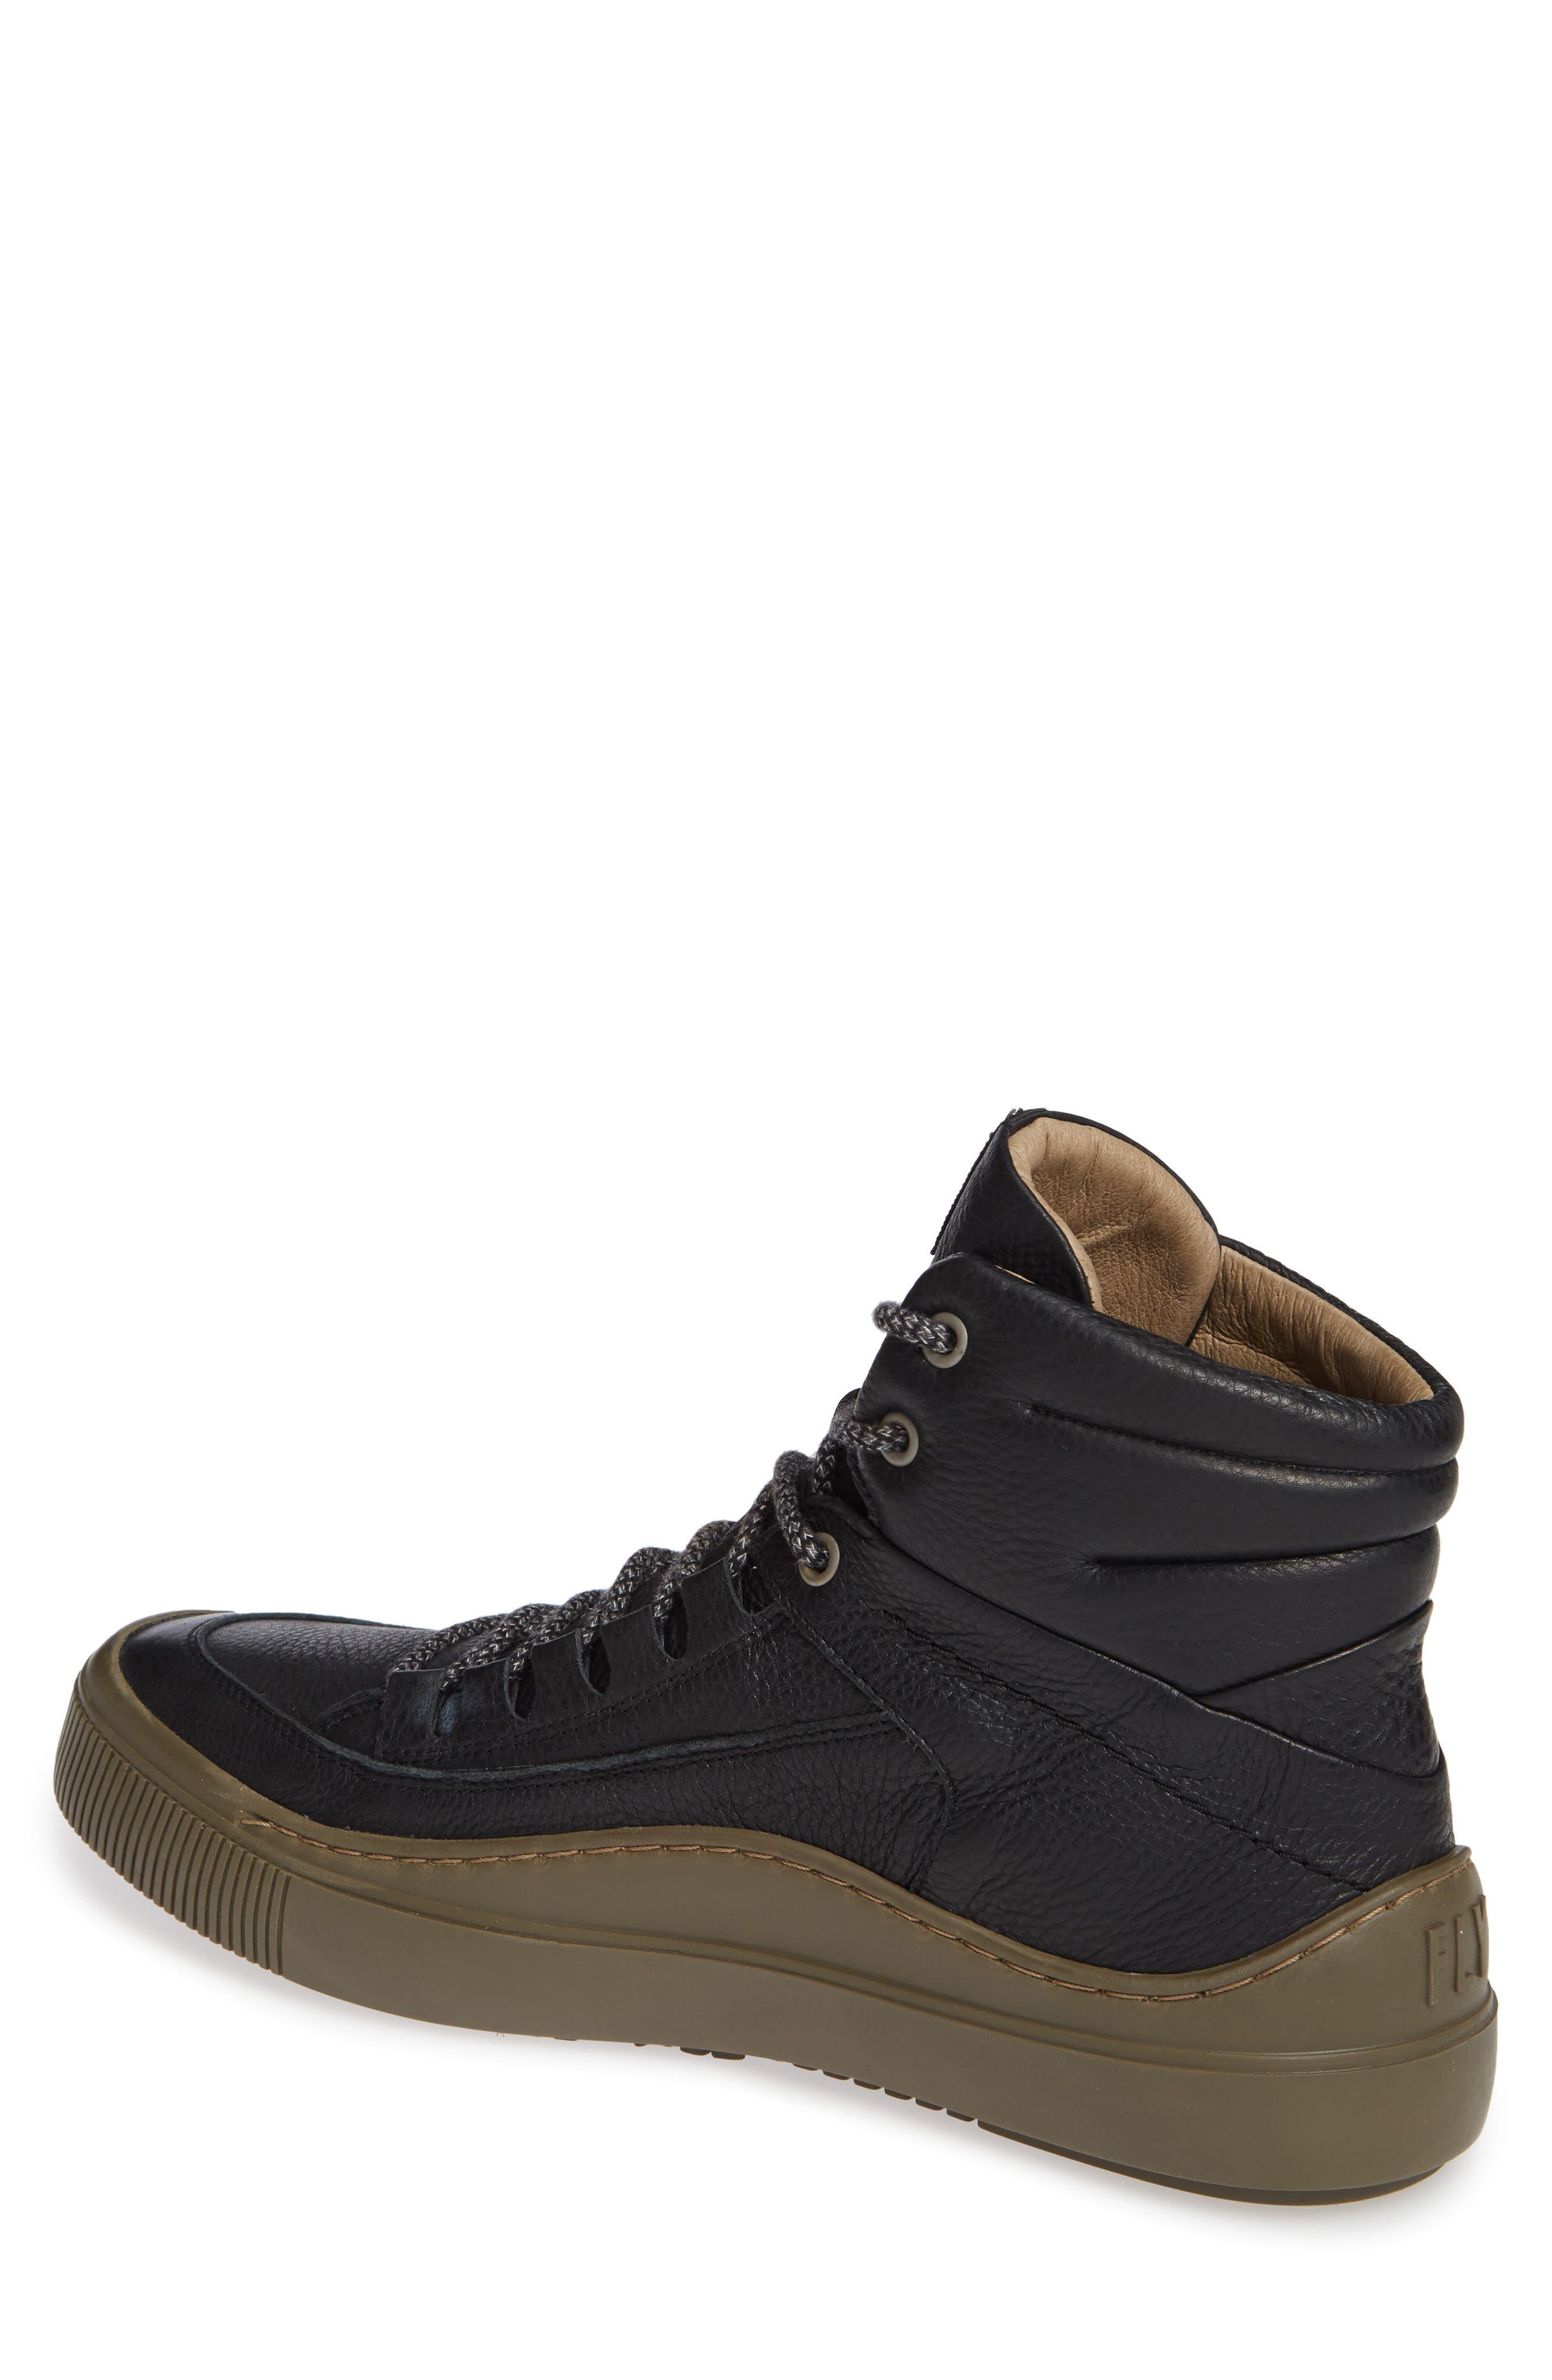 Samu Sneaker,                             Alternate thumbnail 2, color,                             BLACK/ NICOTINE BRITO